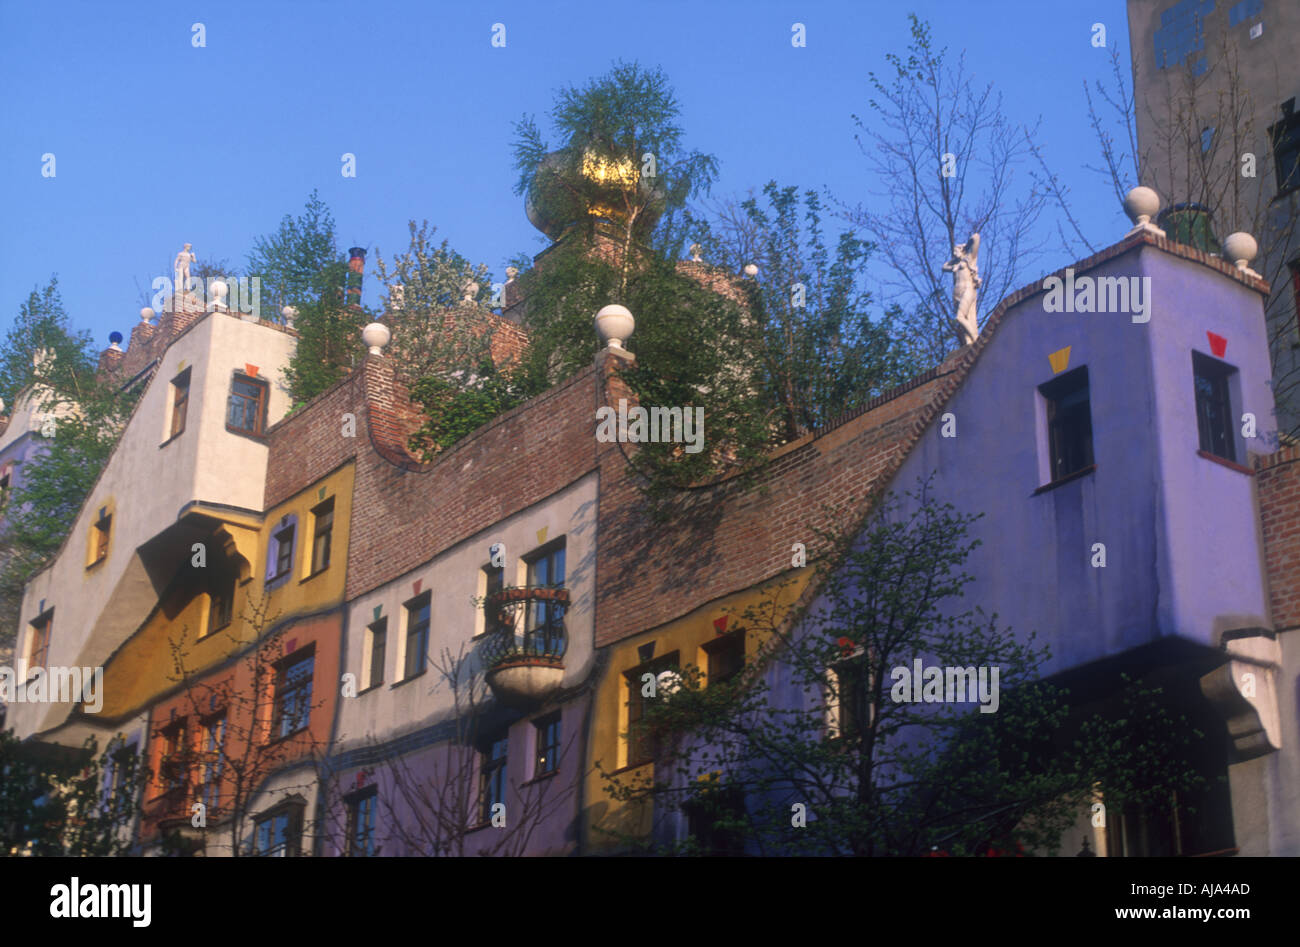 imaginative colored coloured facade of th Hundertwasser House Vienna Wien Austria Oesterreich Europe Europa  Stock Photo